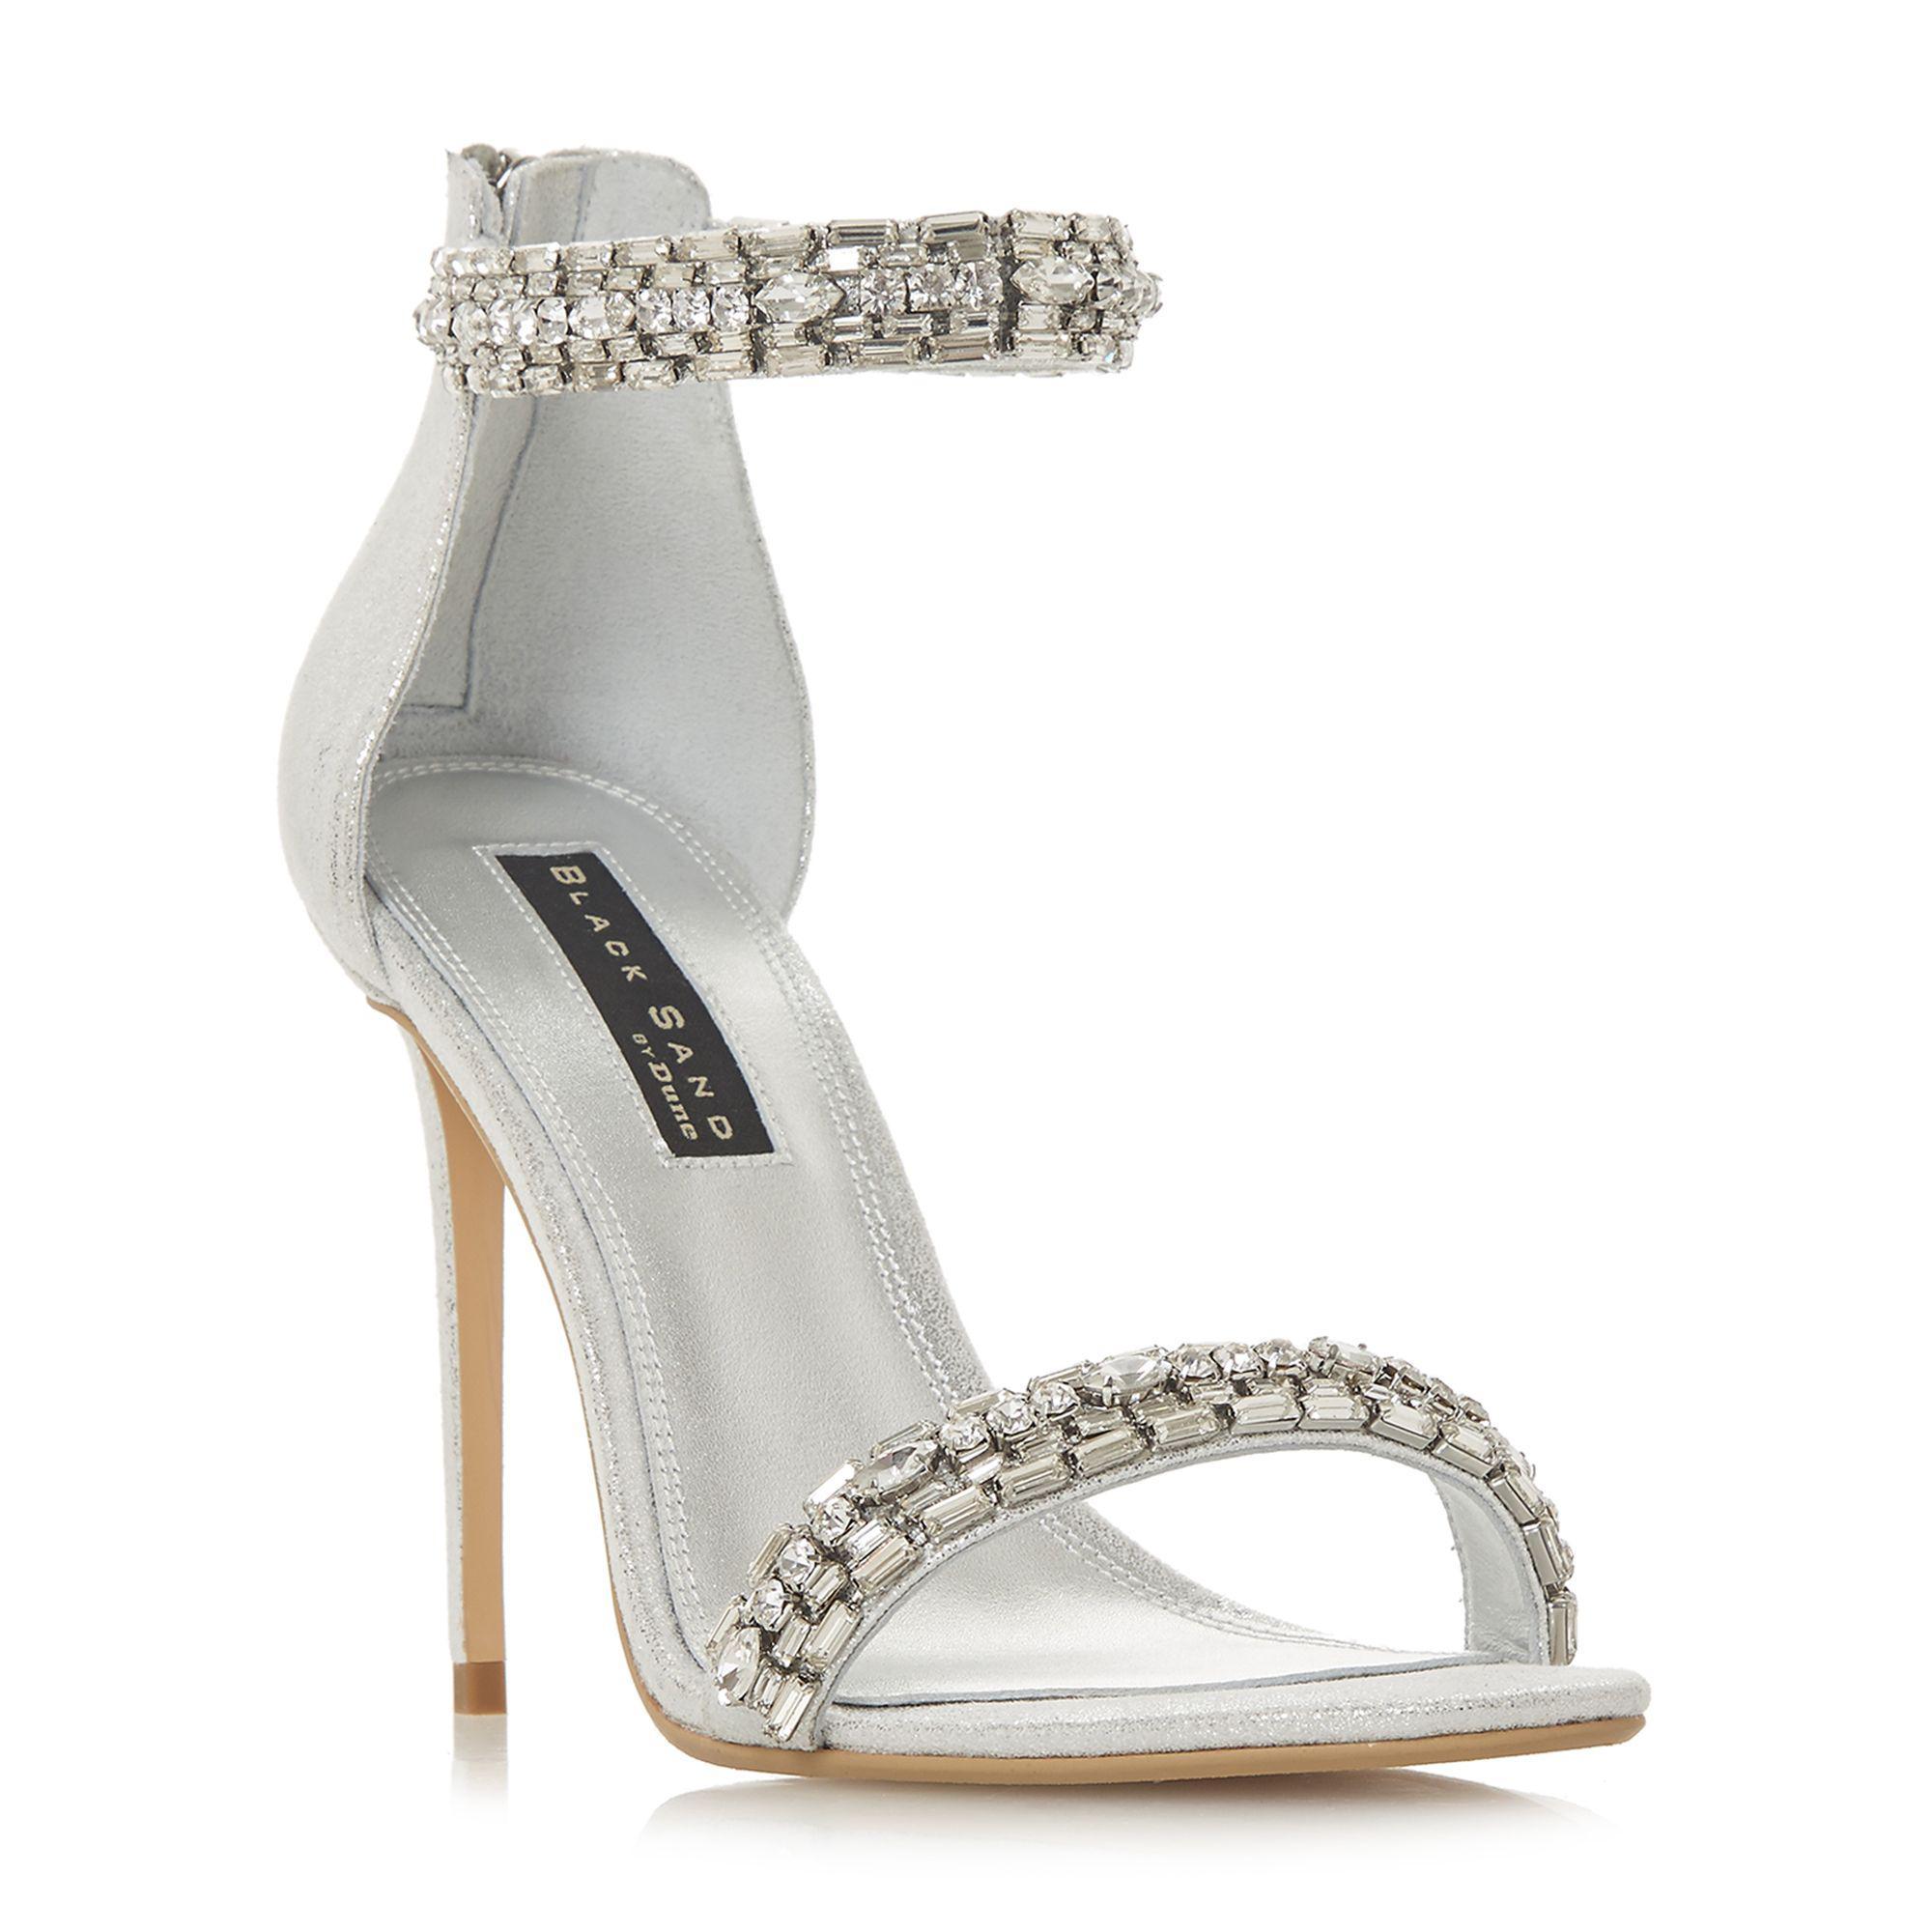 faa3982c3d1 Dune Silver  marniee  High Stiletto Heel Peep Toe Sandals in ...